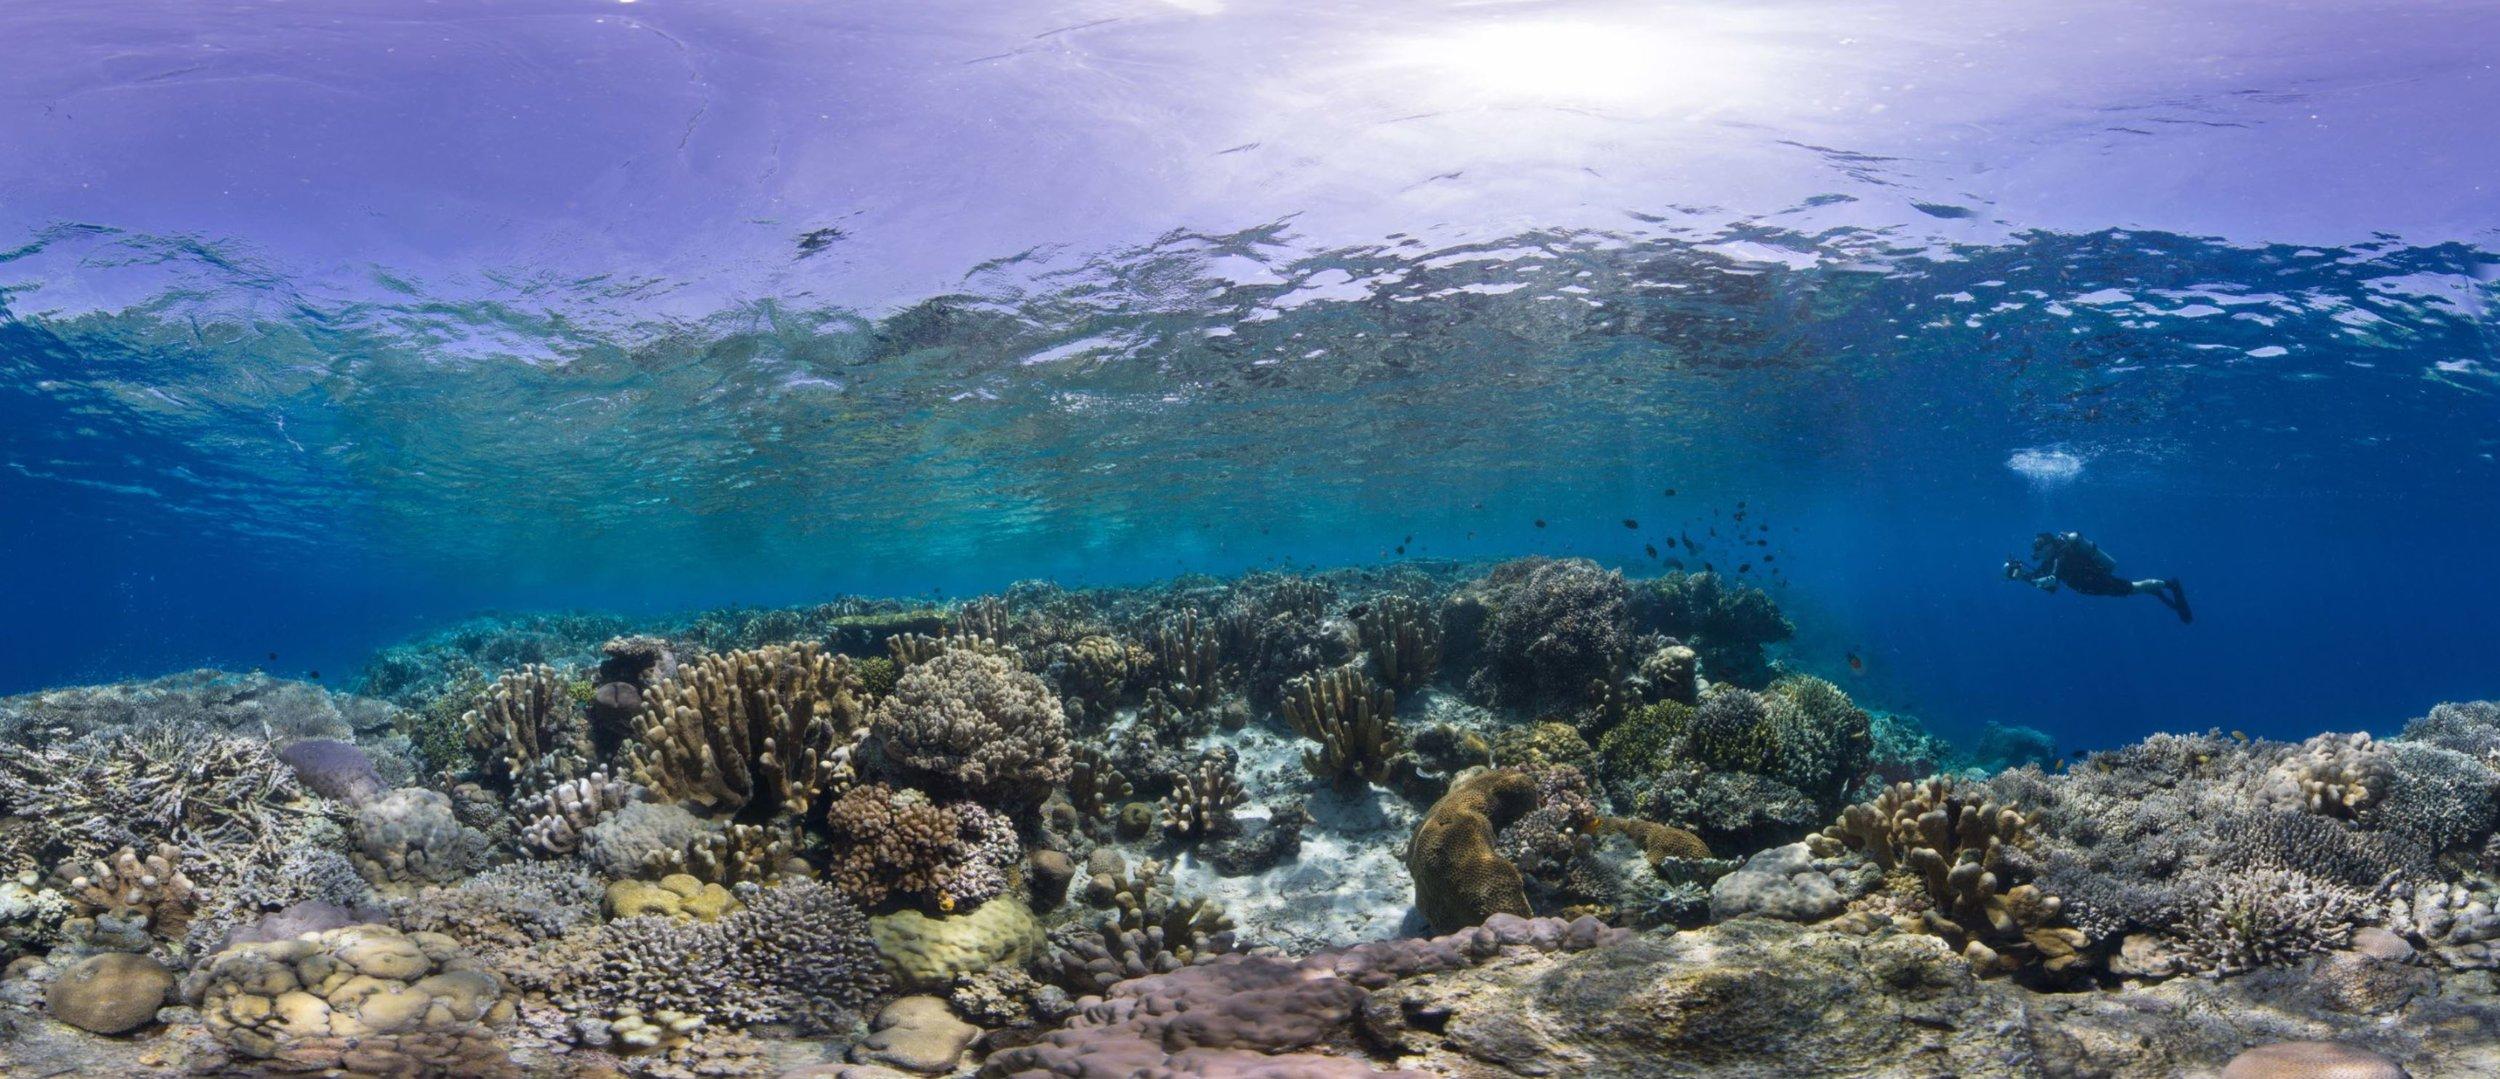 25- a HEALTHY coral reef in manado, indonesia Credit: The ocean agency / paul g. allen philanthropies